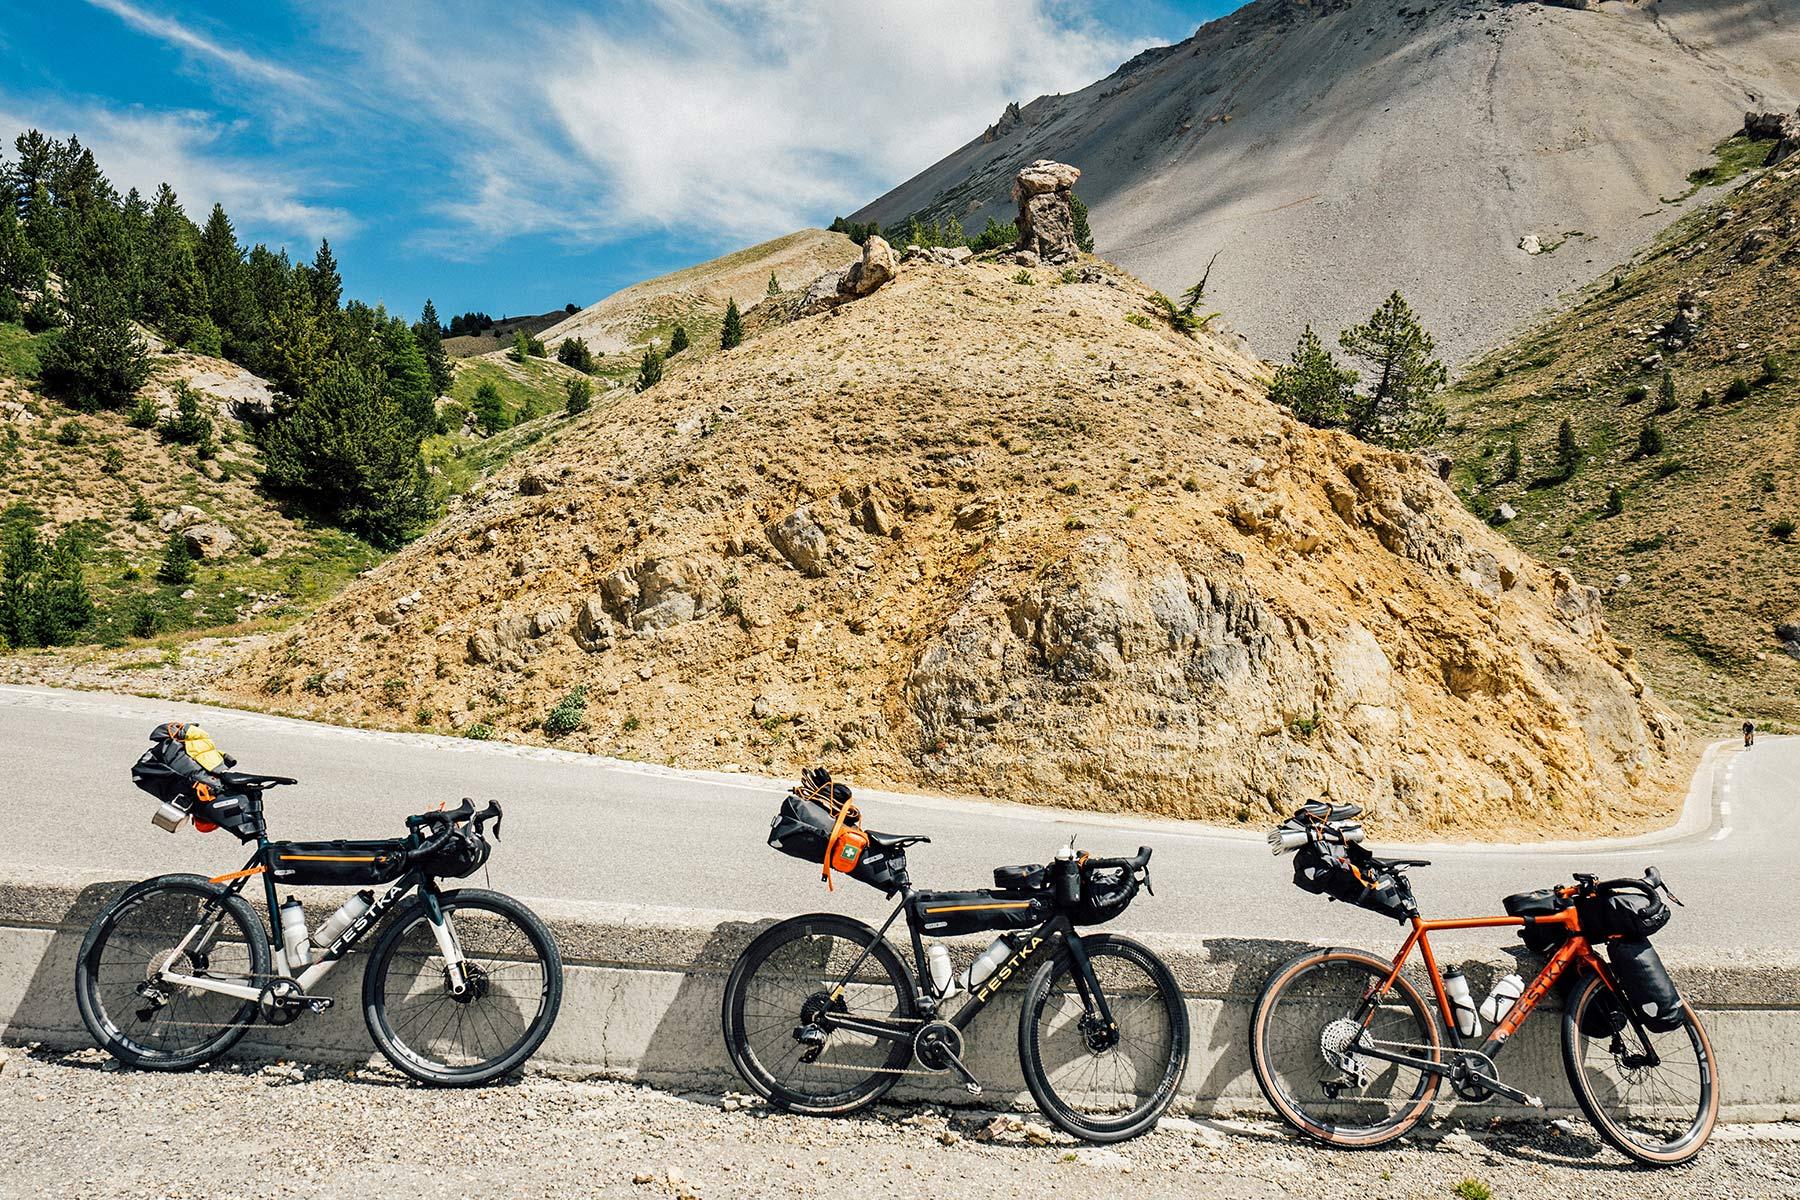 Festka Scout custom carbon adventure gravel bike,bikepacking